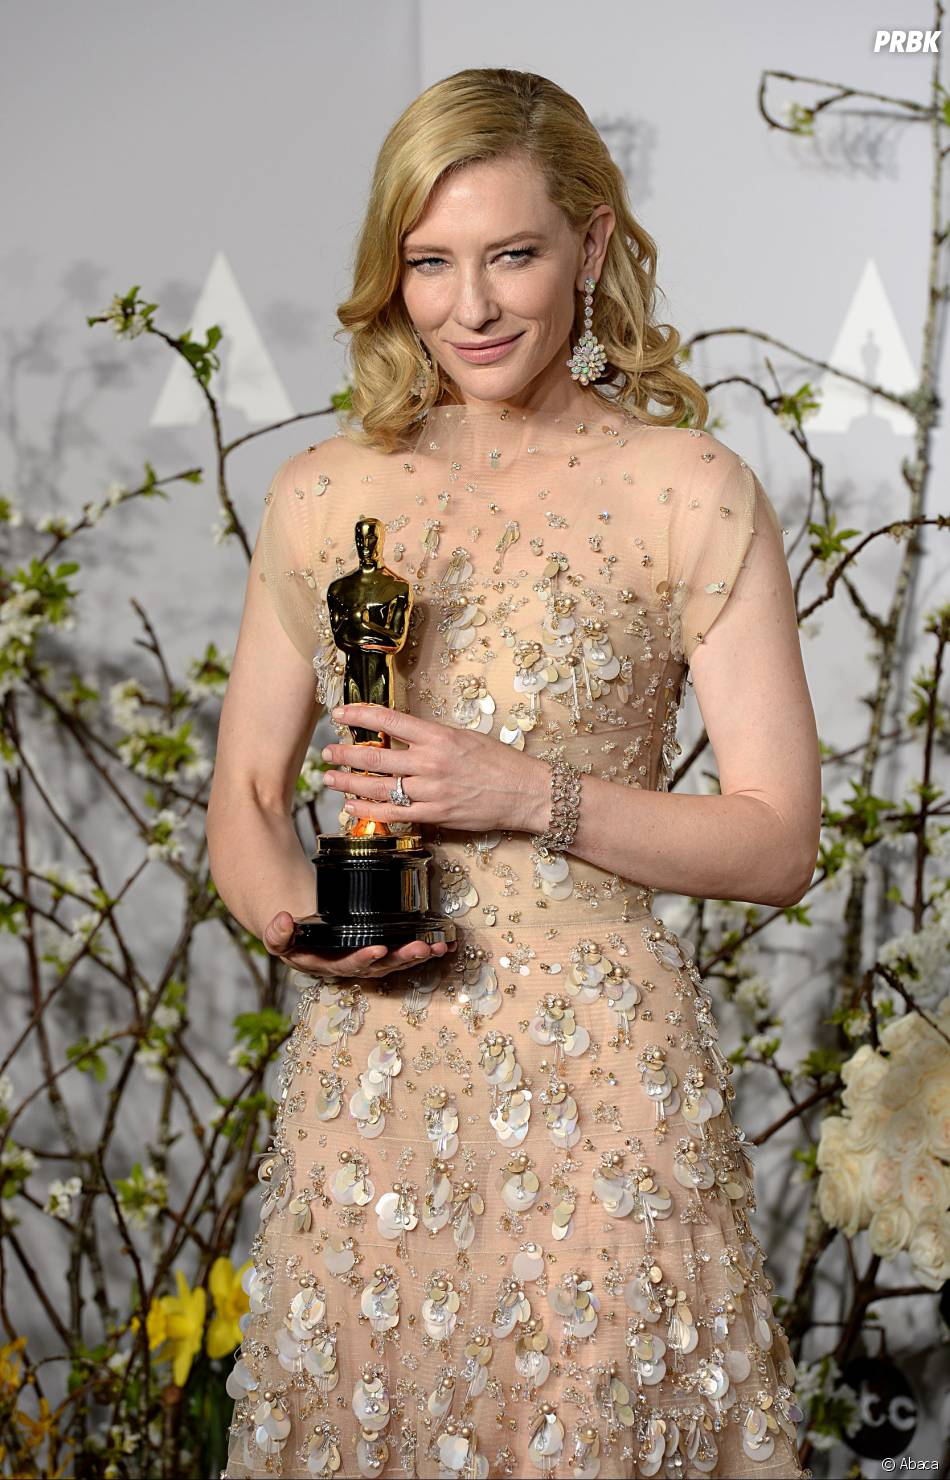 Cate Blanchett gagnante aux Oscars 2014 le 2 mars à Los Angeles